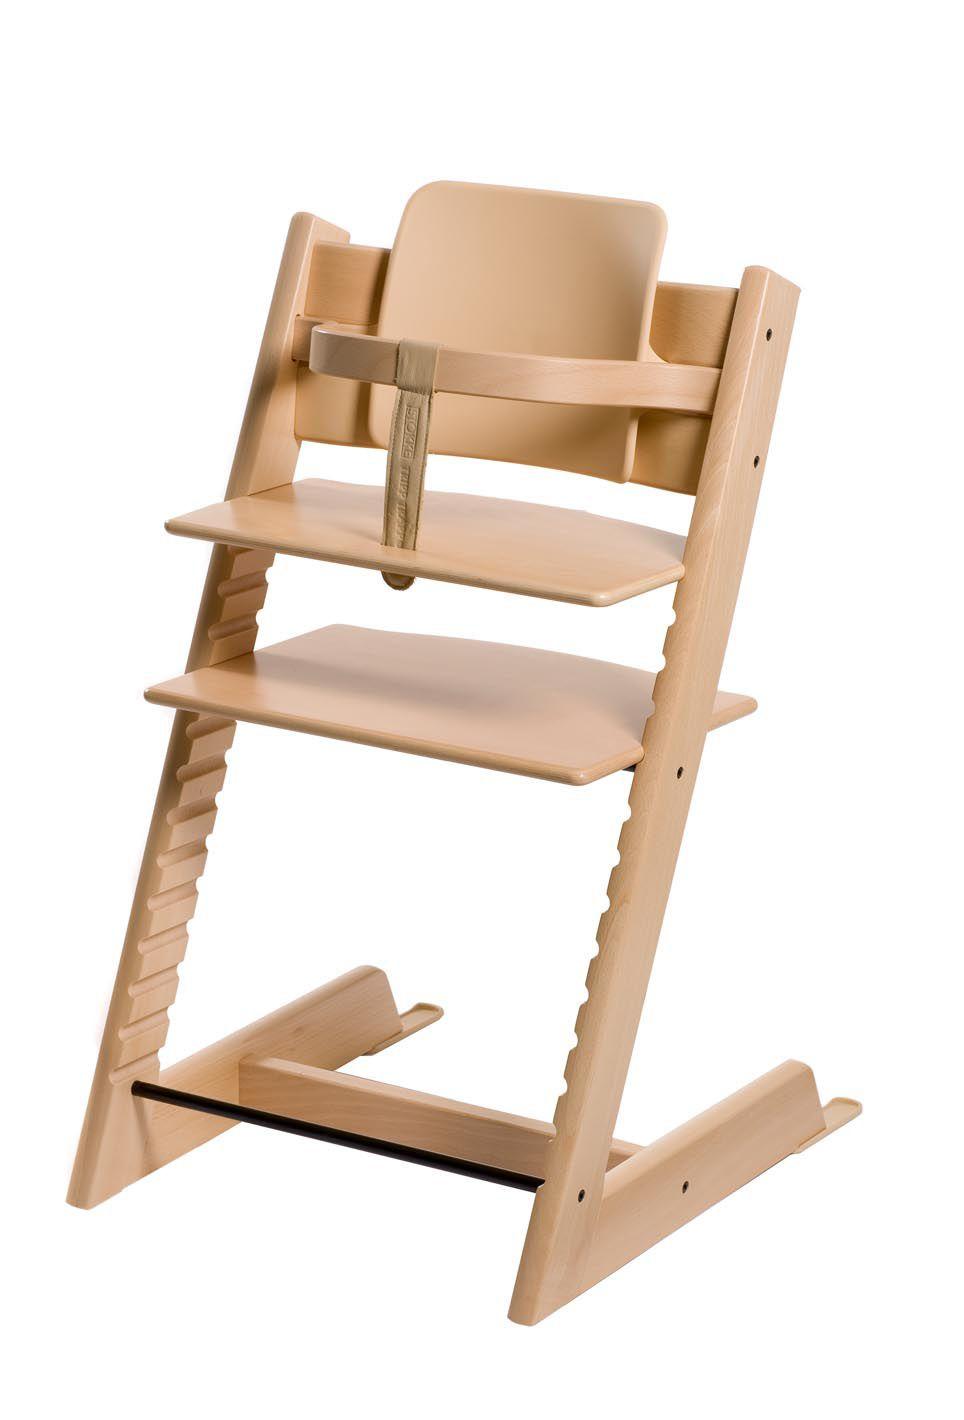 trip trap highchair called stokke very popular in denmark danish brands pinterest. Black Bedroom Furniture Sets. Home Design Ideas